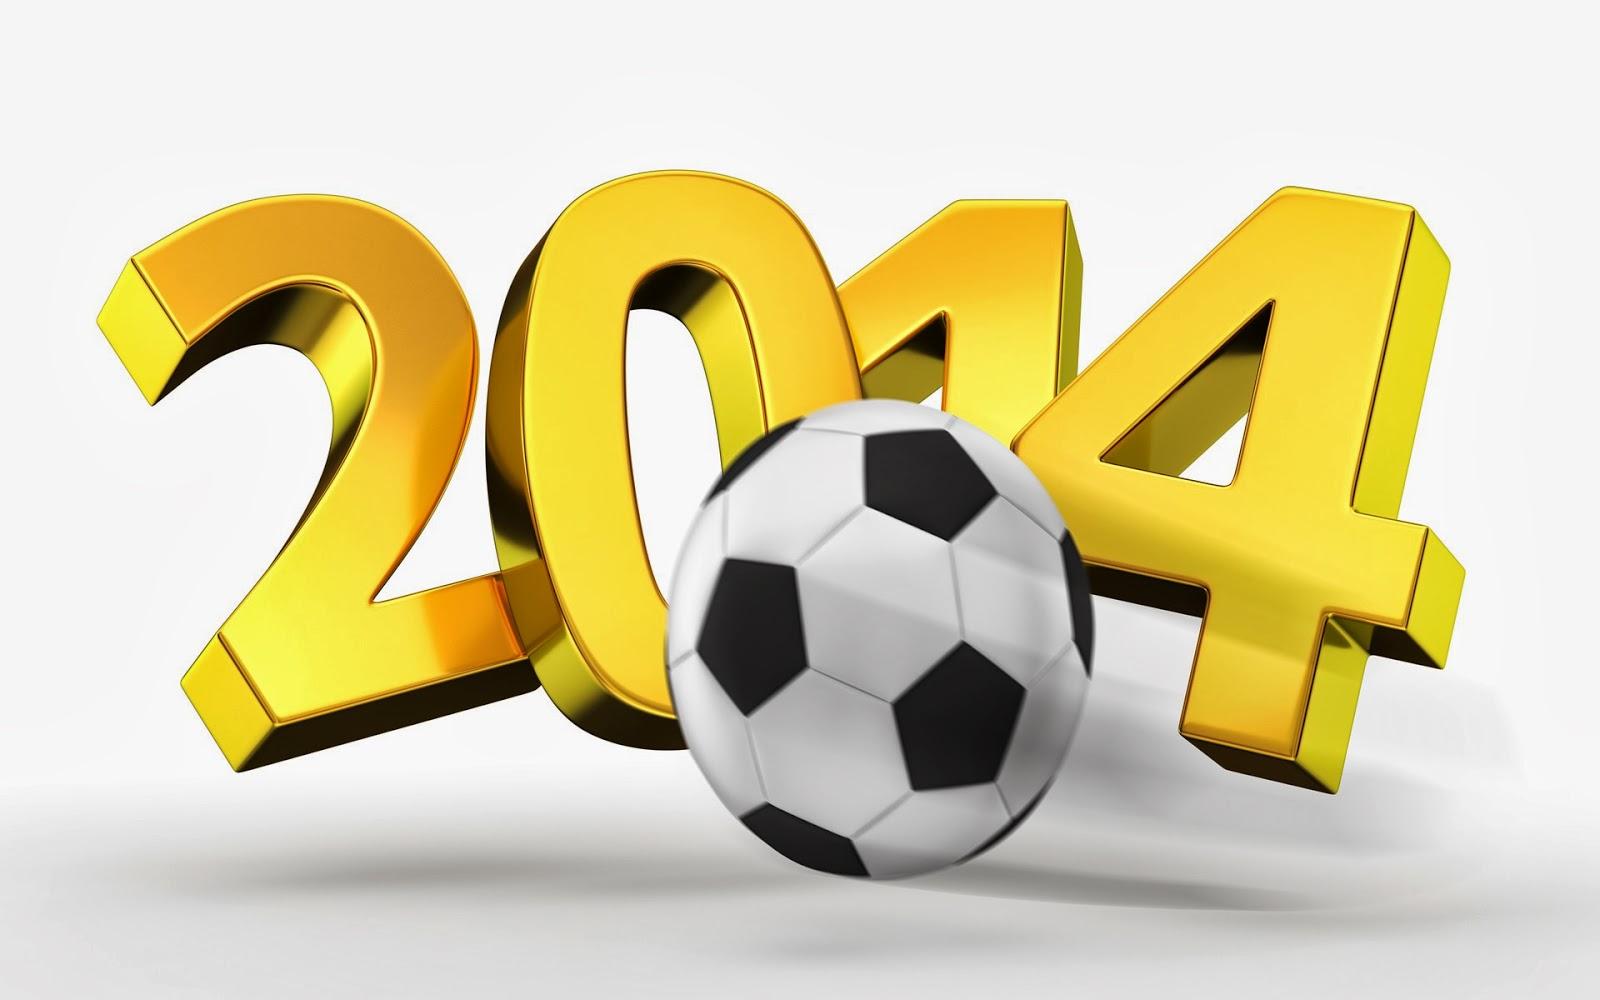 Soccer Happy New Year 2014